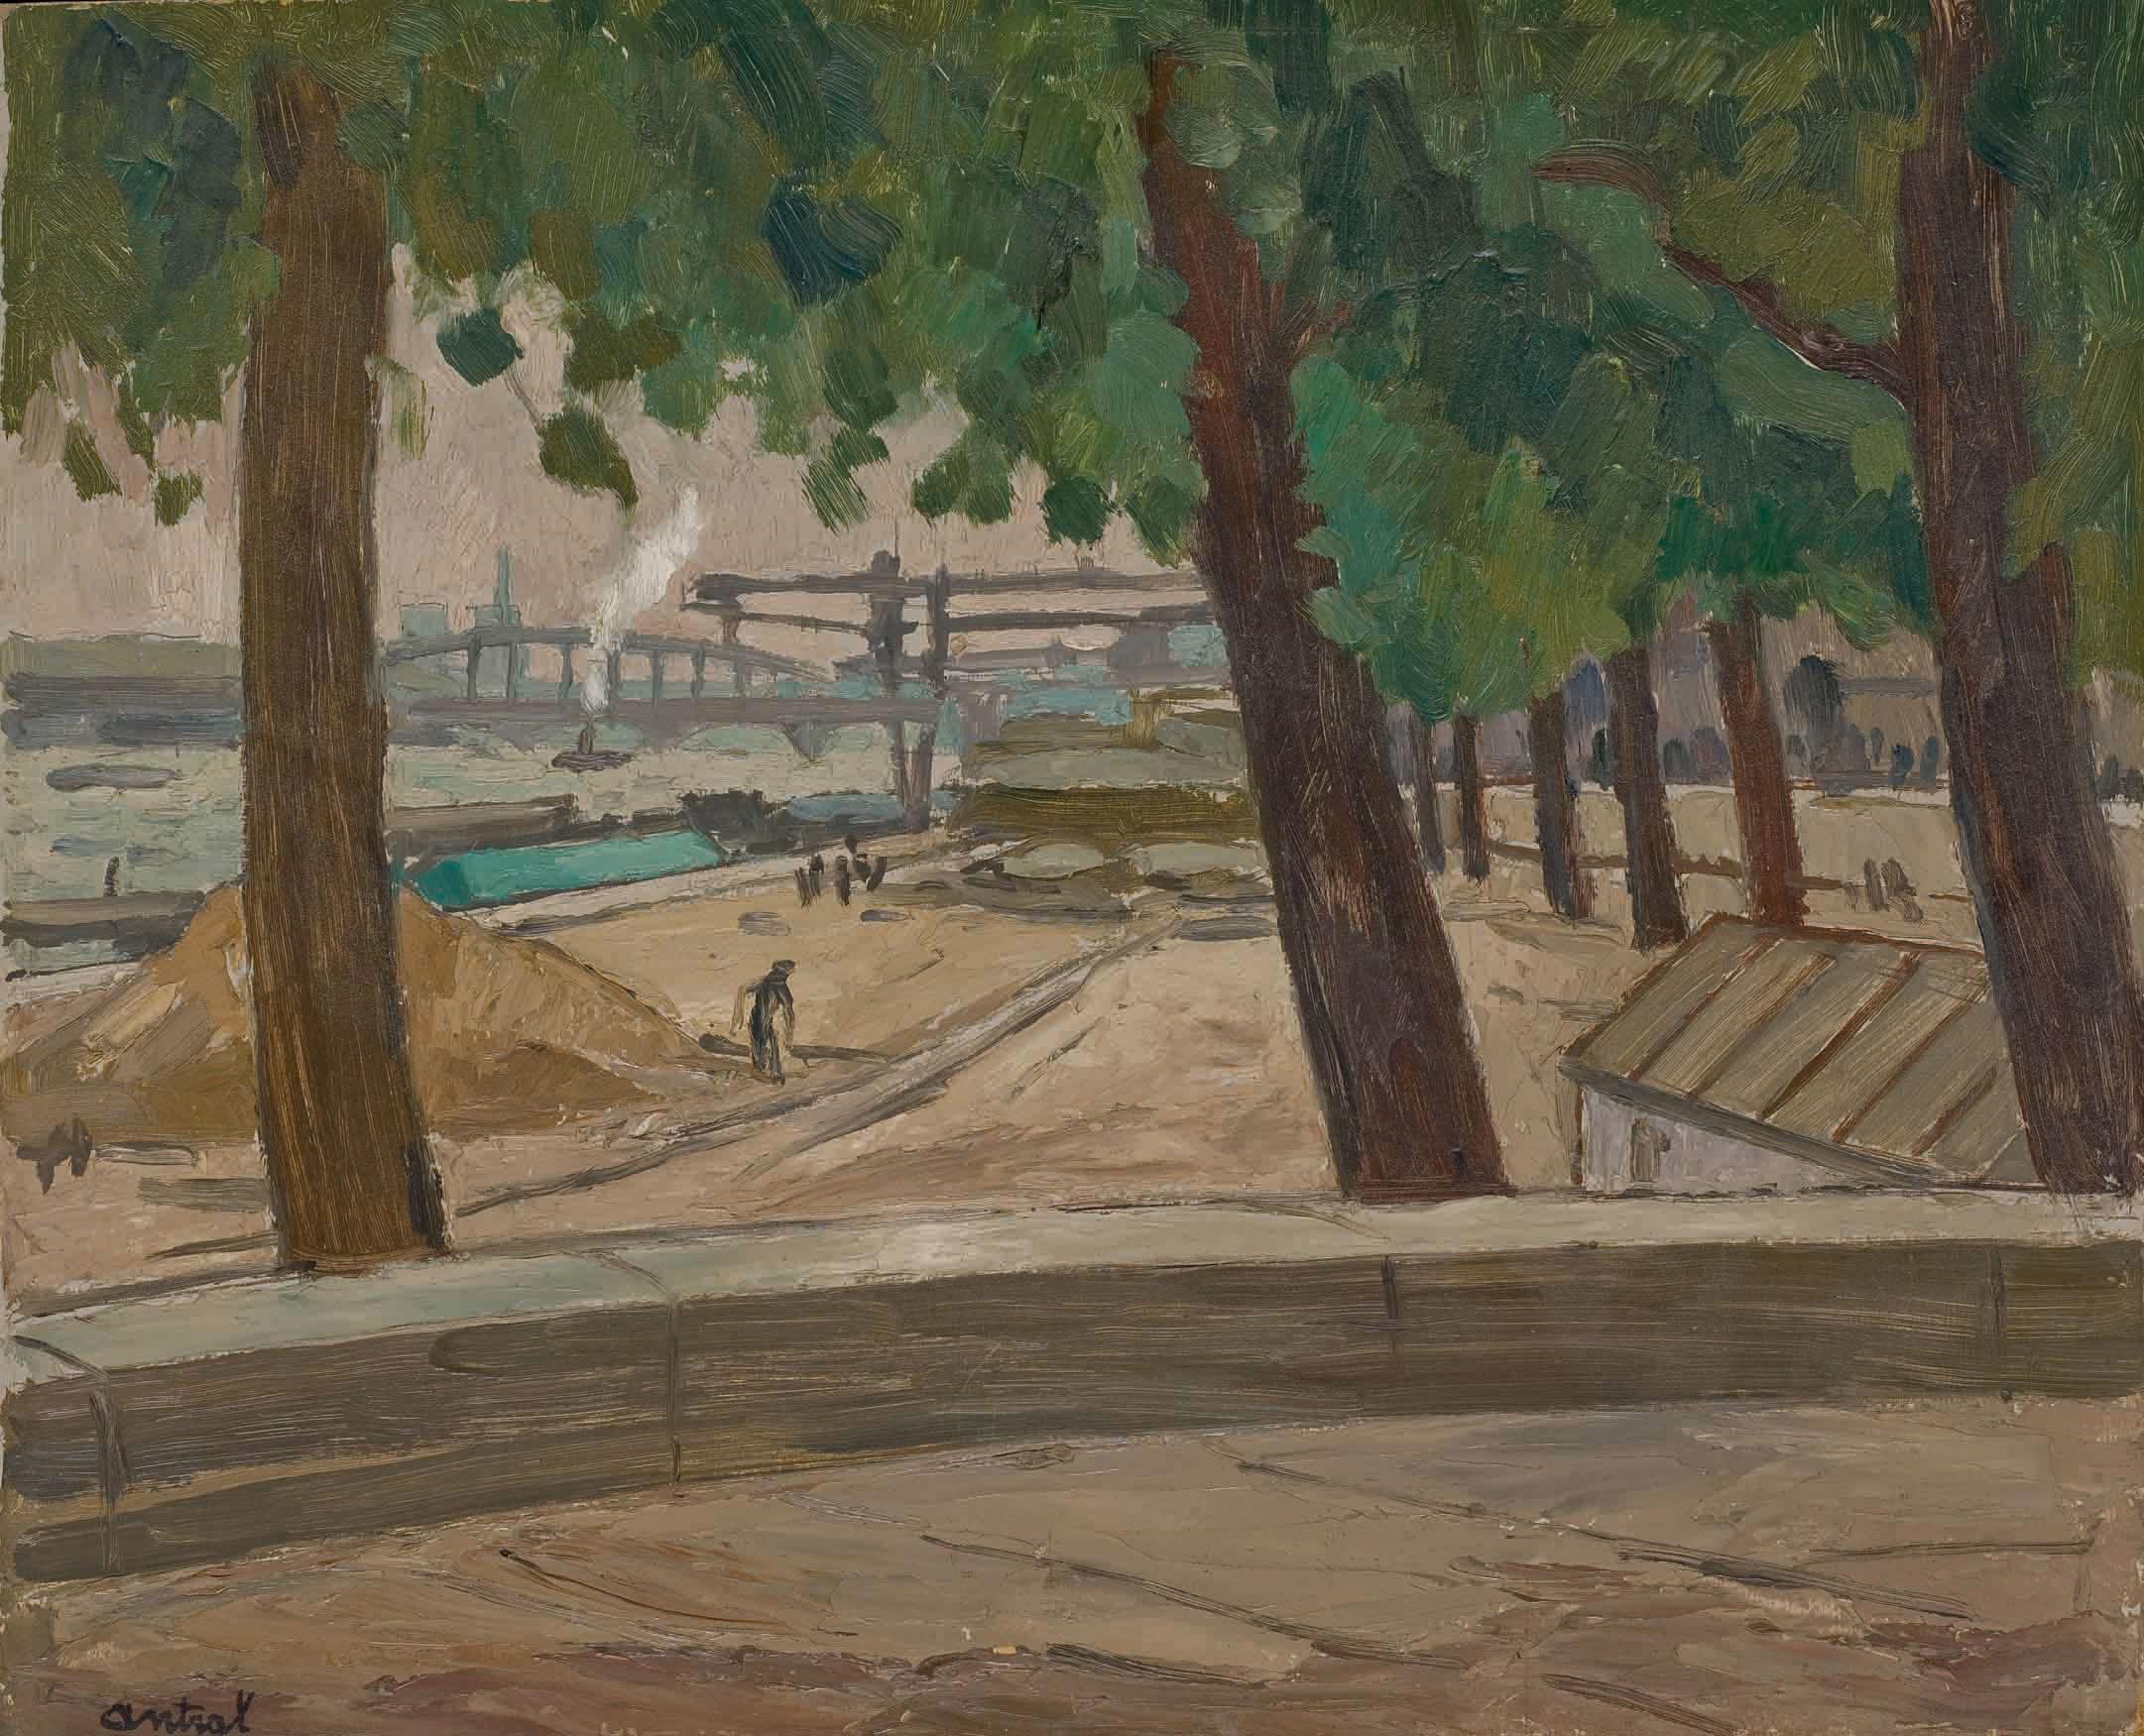 ROBERT LOUIS ANTRAL (1895-1940